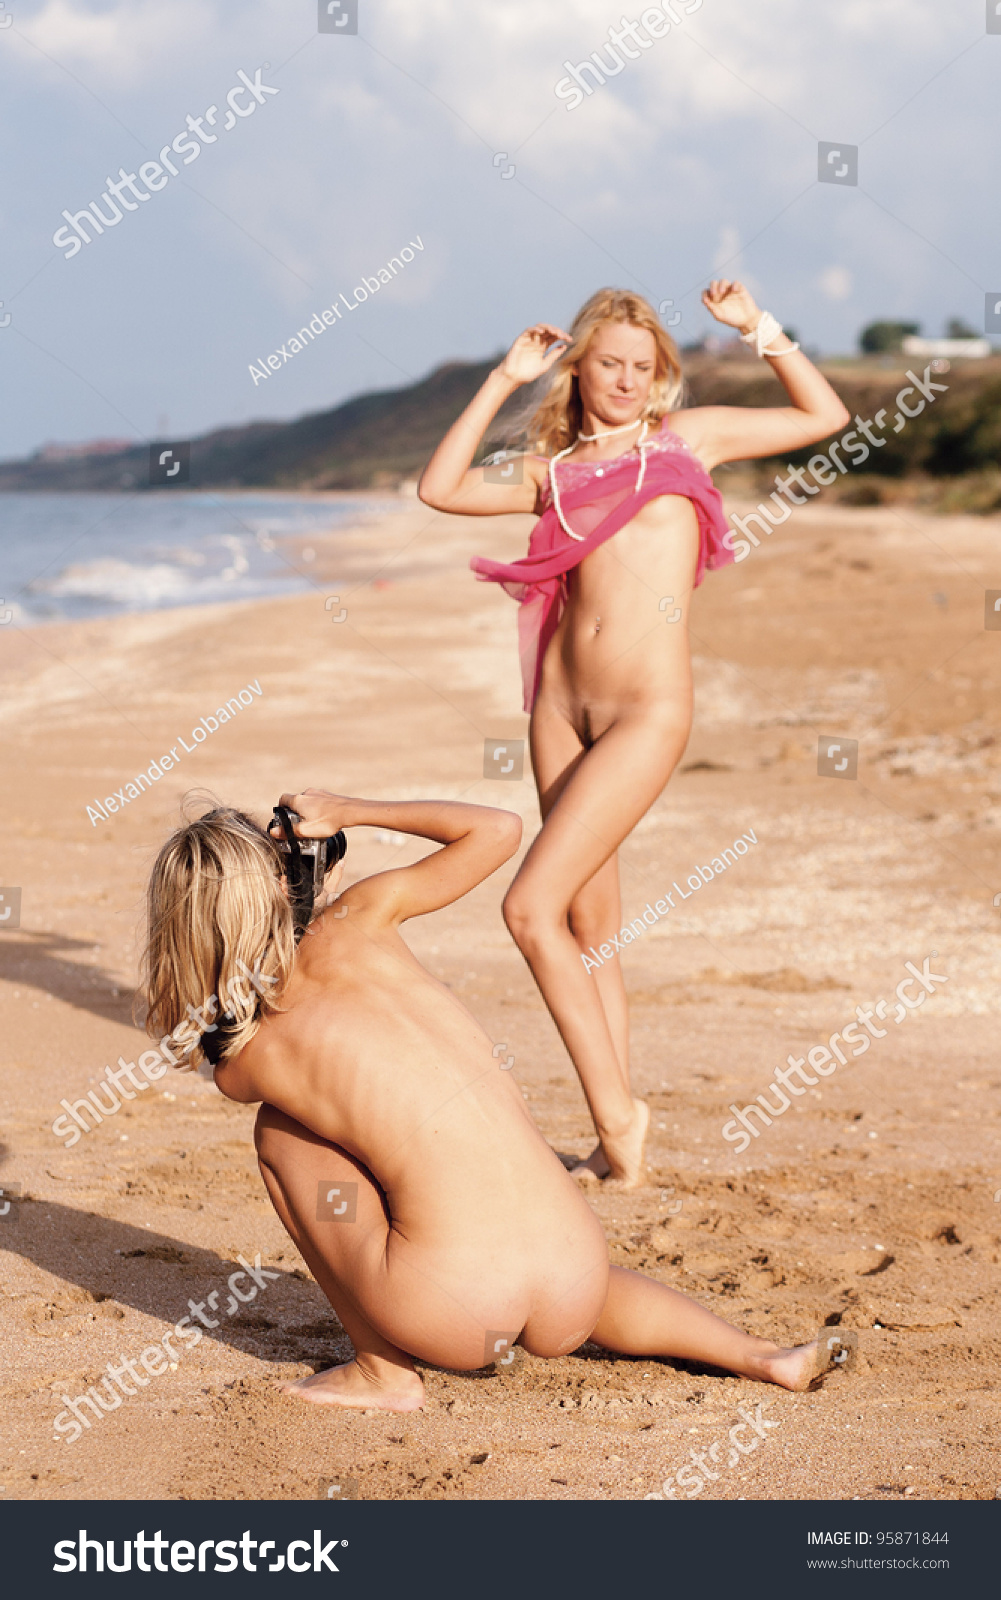 naked favdolls[[[[[[[[[「「 ]]] naked favdolls[[[[[[[[[[[2 naked favdolls